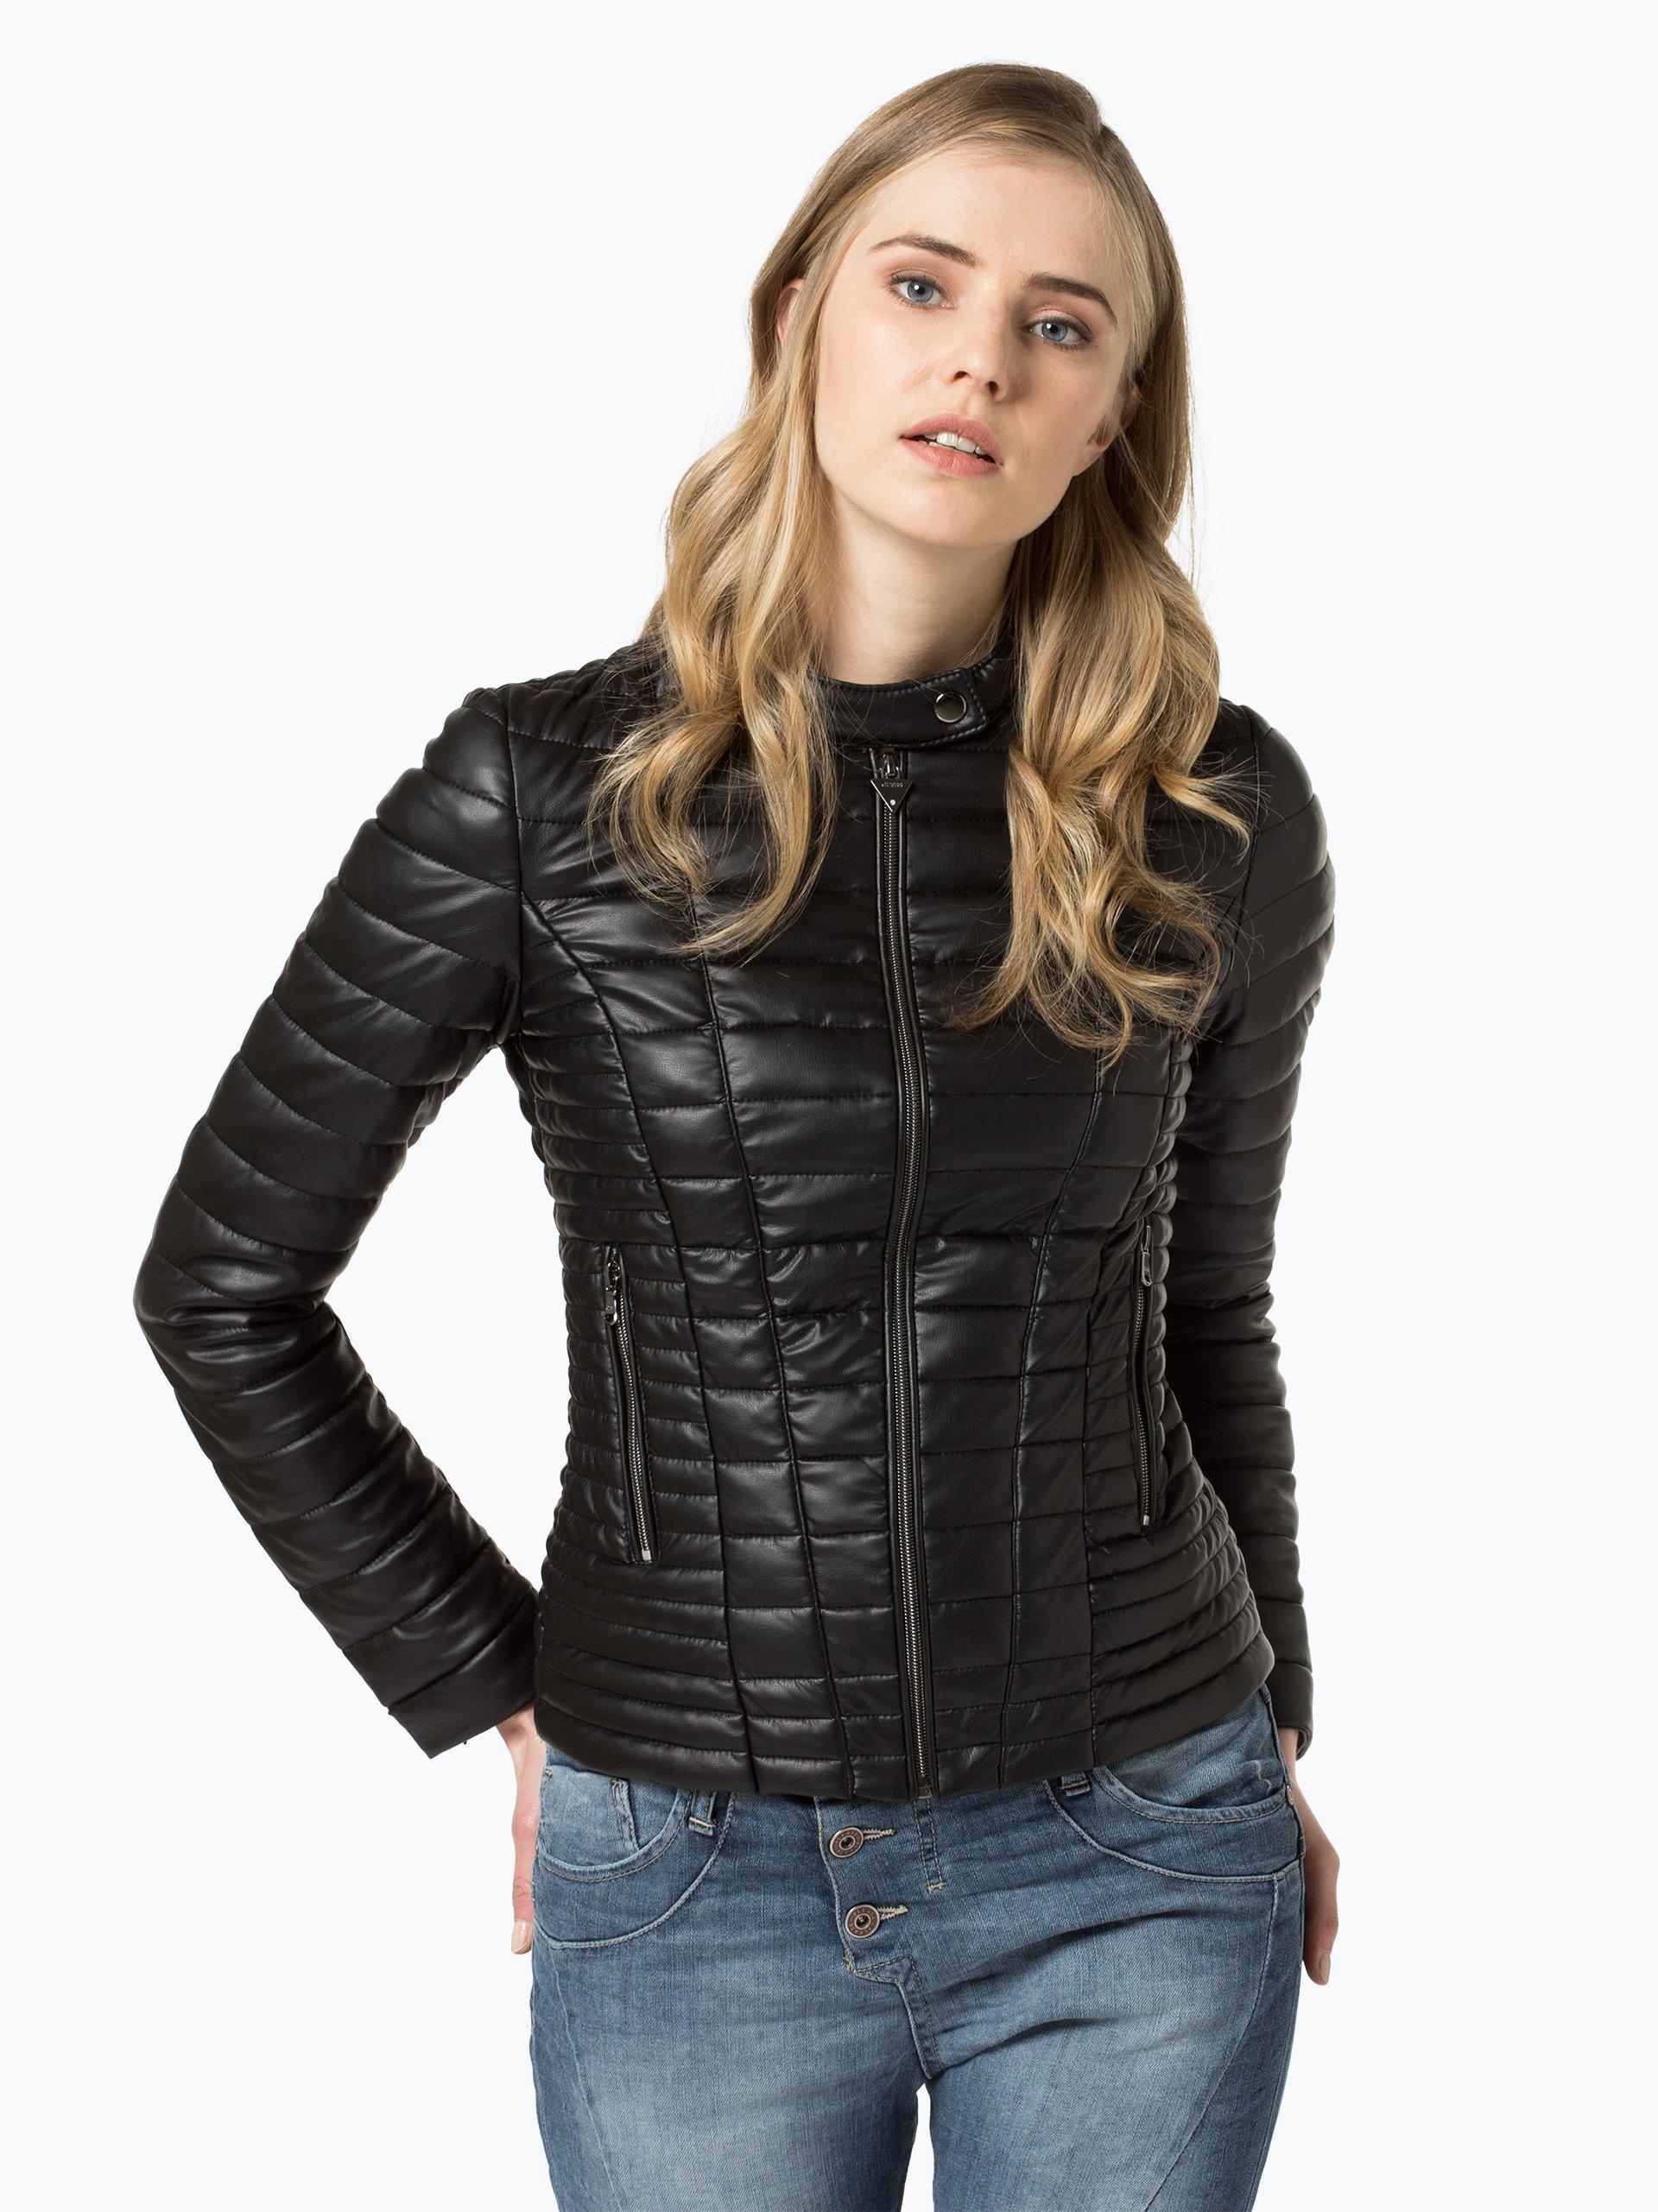 guess jeans damen jacke schwarz uni online kaufen peek. Black Bedroom Furniture Sets. Home Design Ideas